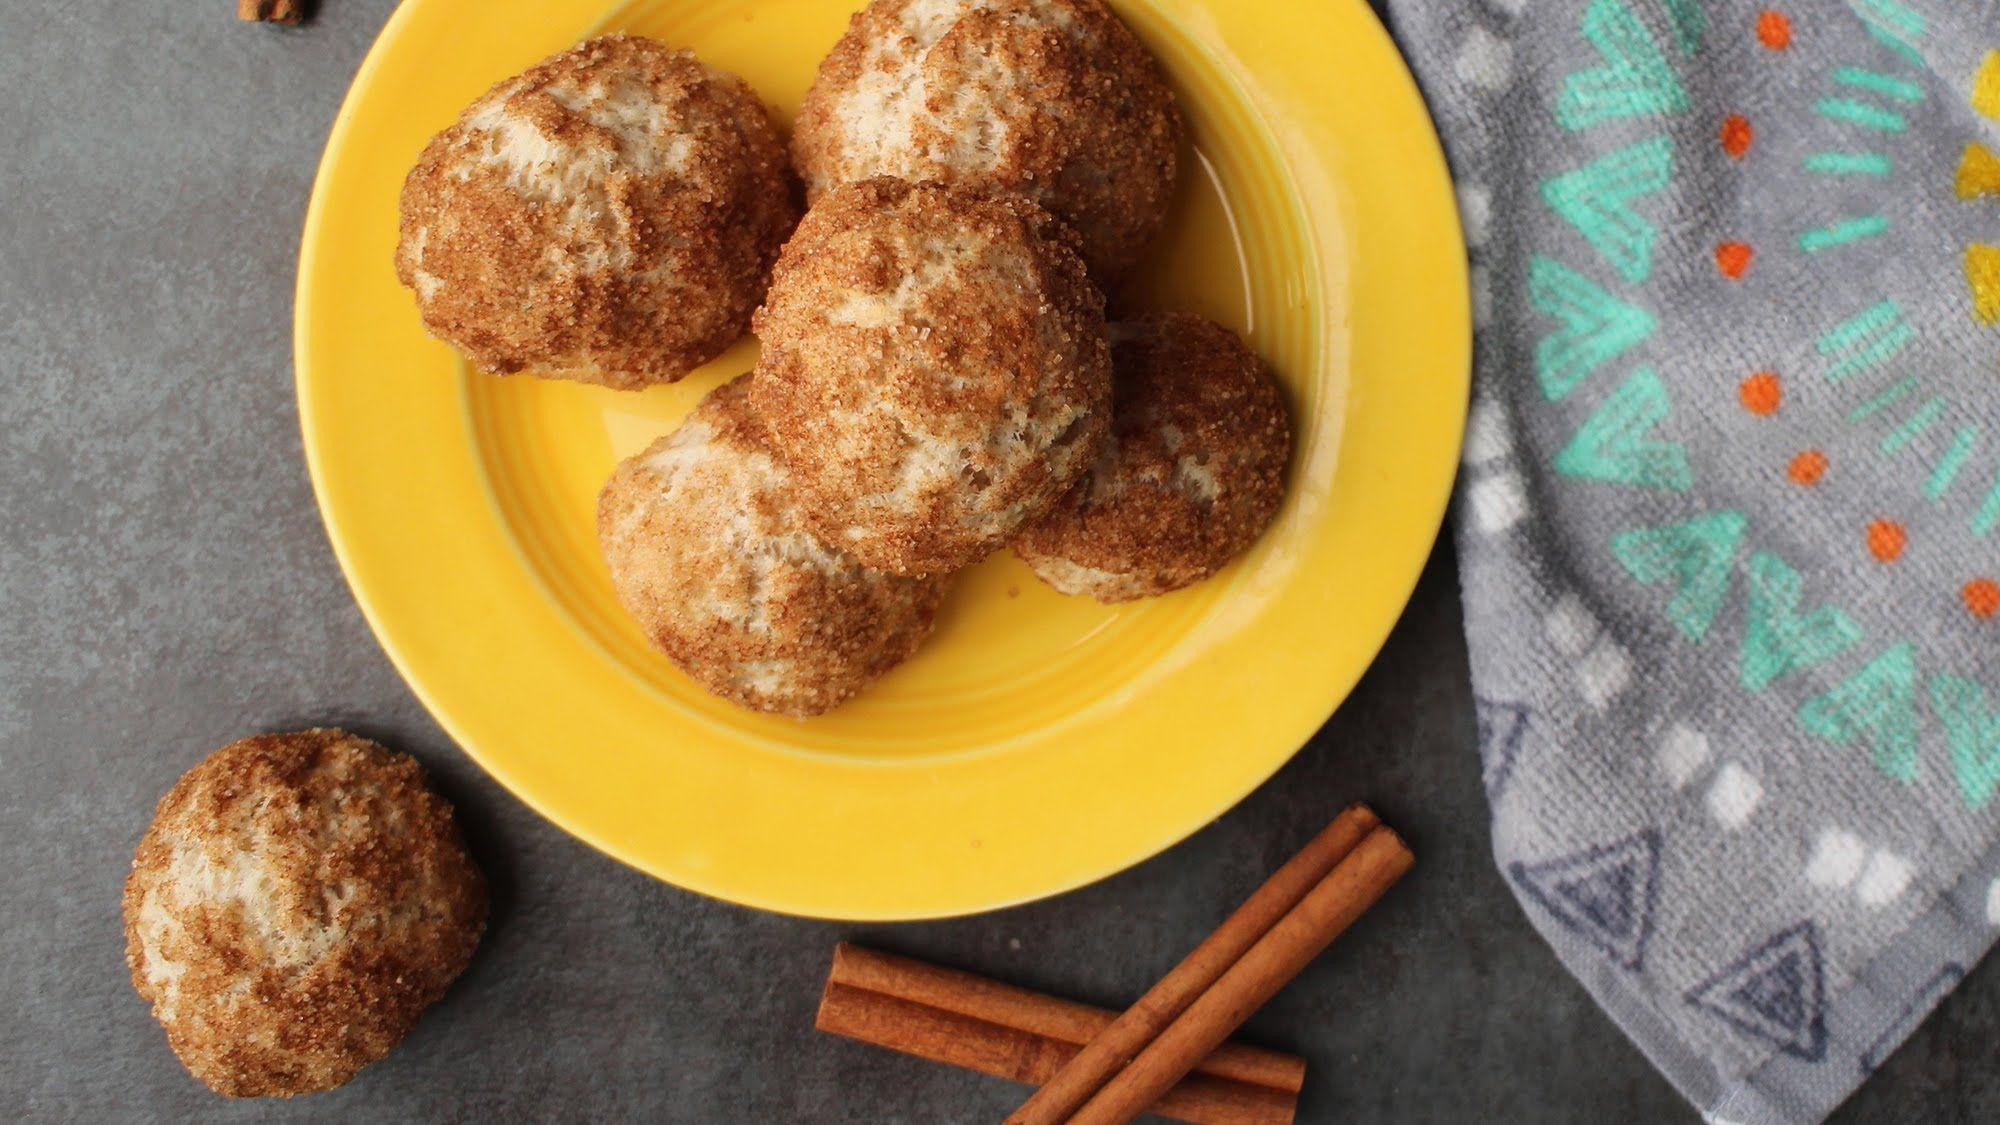 Churrostyle vegan doughnut holes made in the air fryer